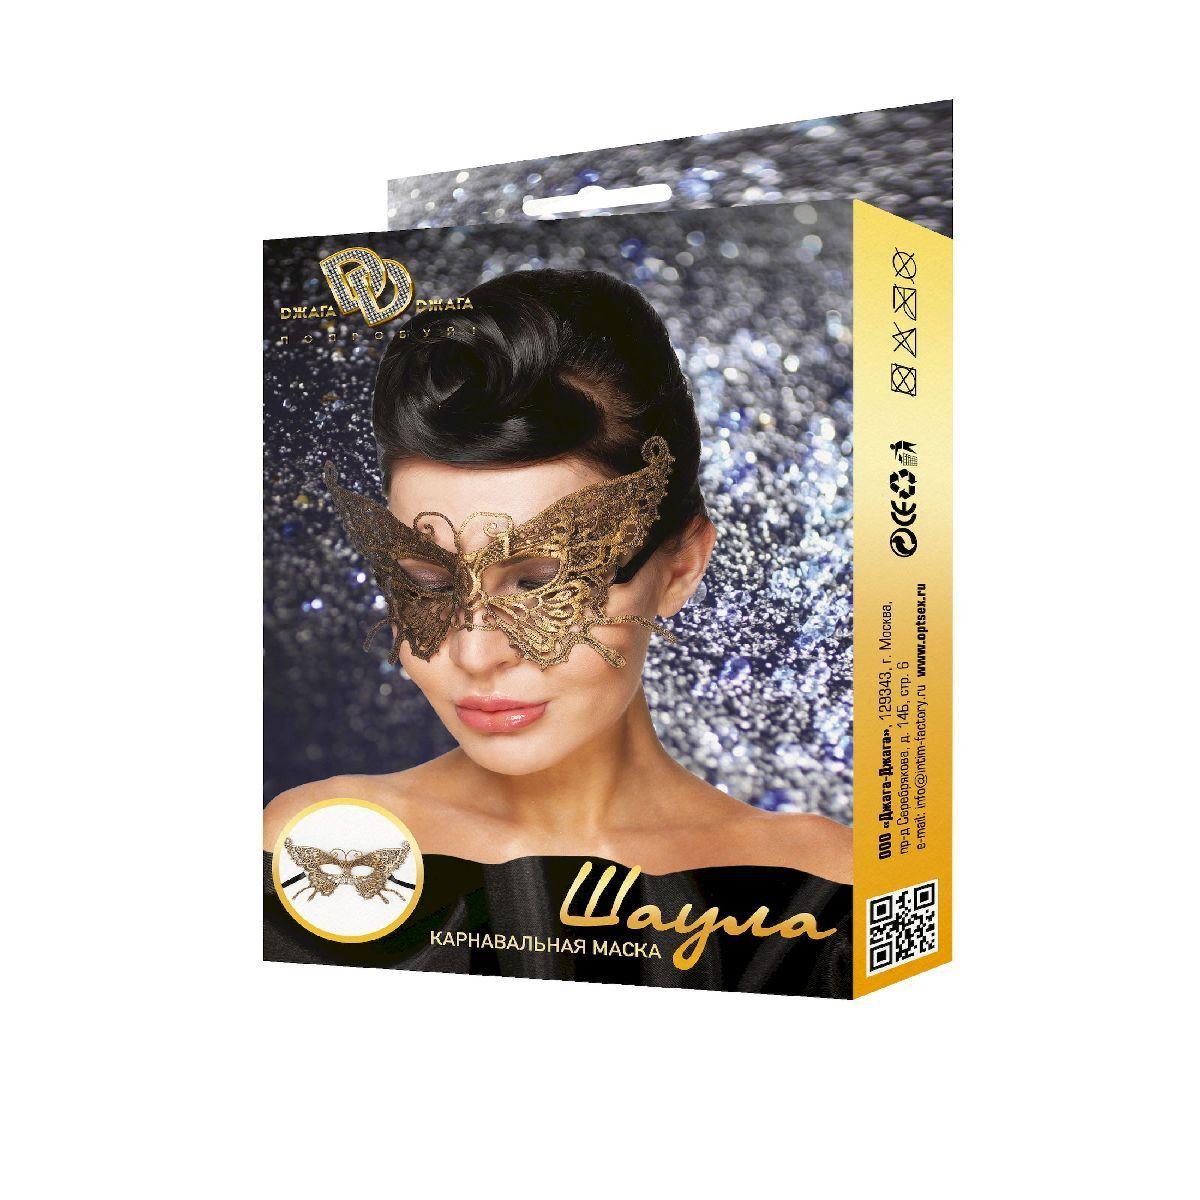 Золотистая карнавальная маска  Шаула